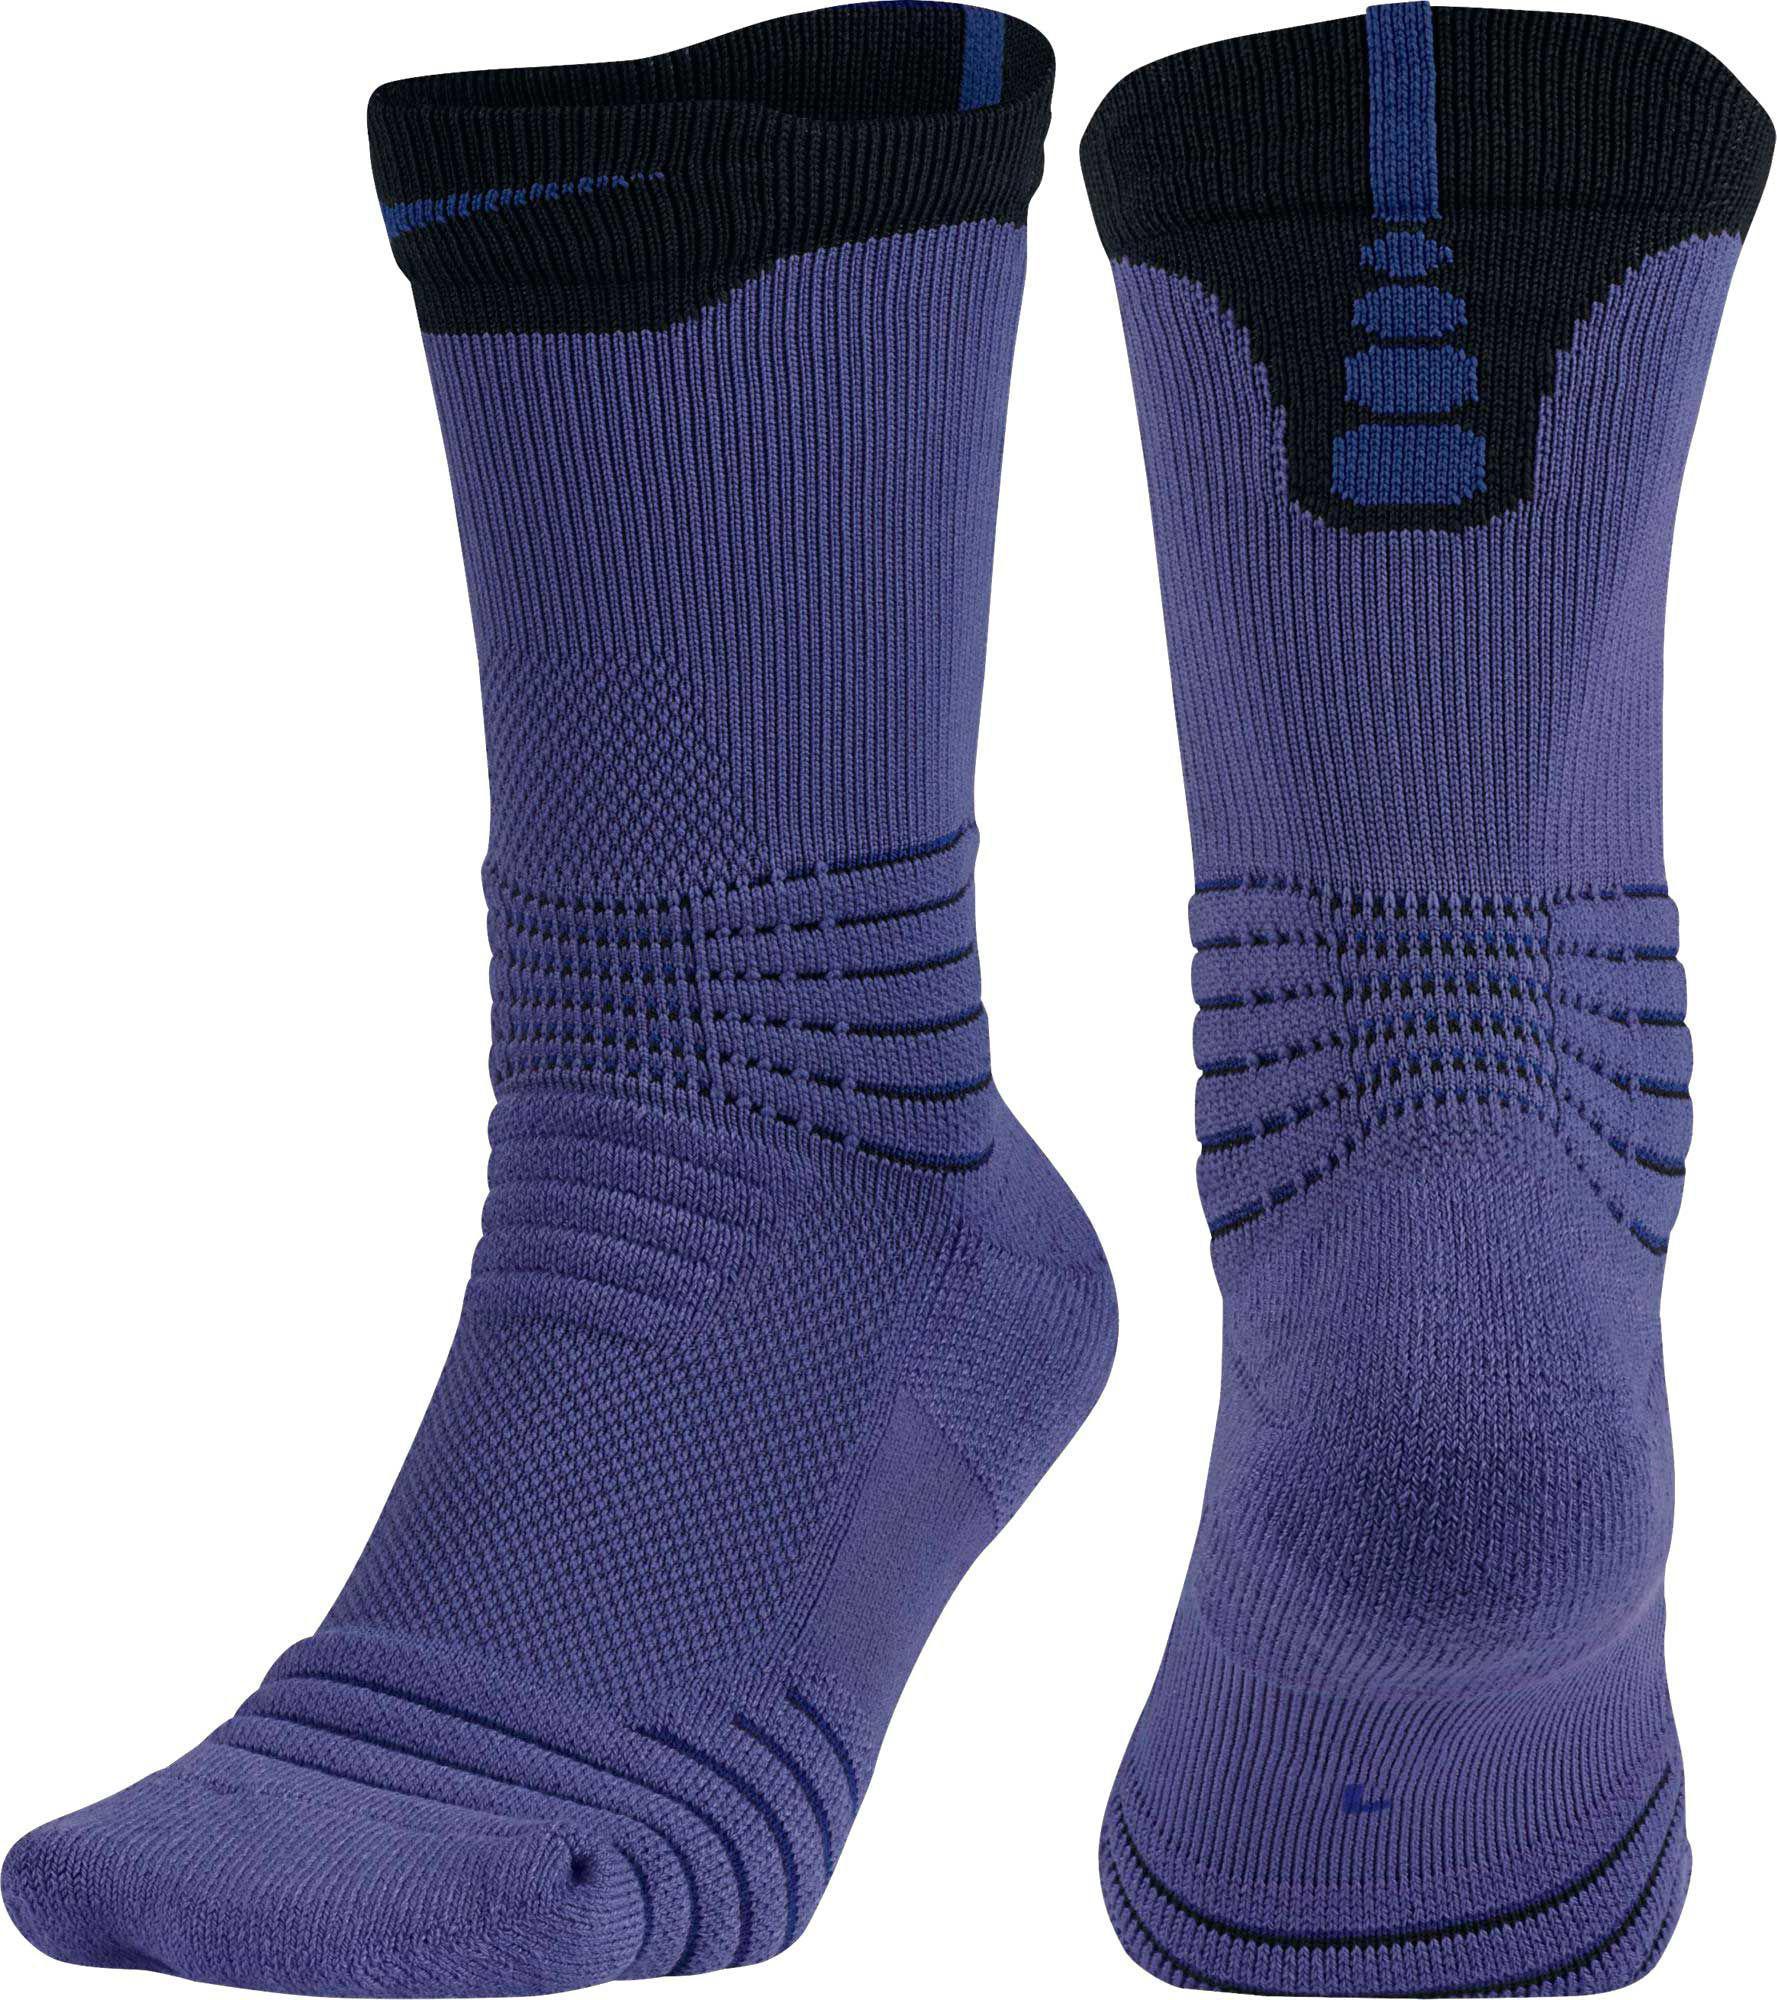 9a991b85708 Lyst - Nike Elite Versatility Crew Basketball Socks in Purple for Men